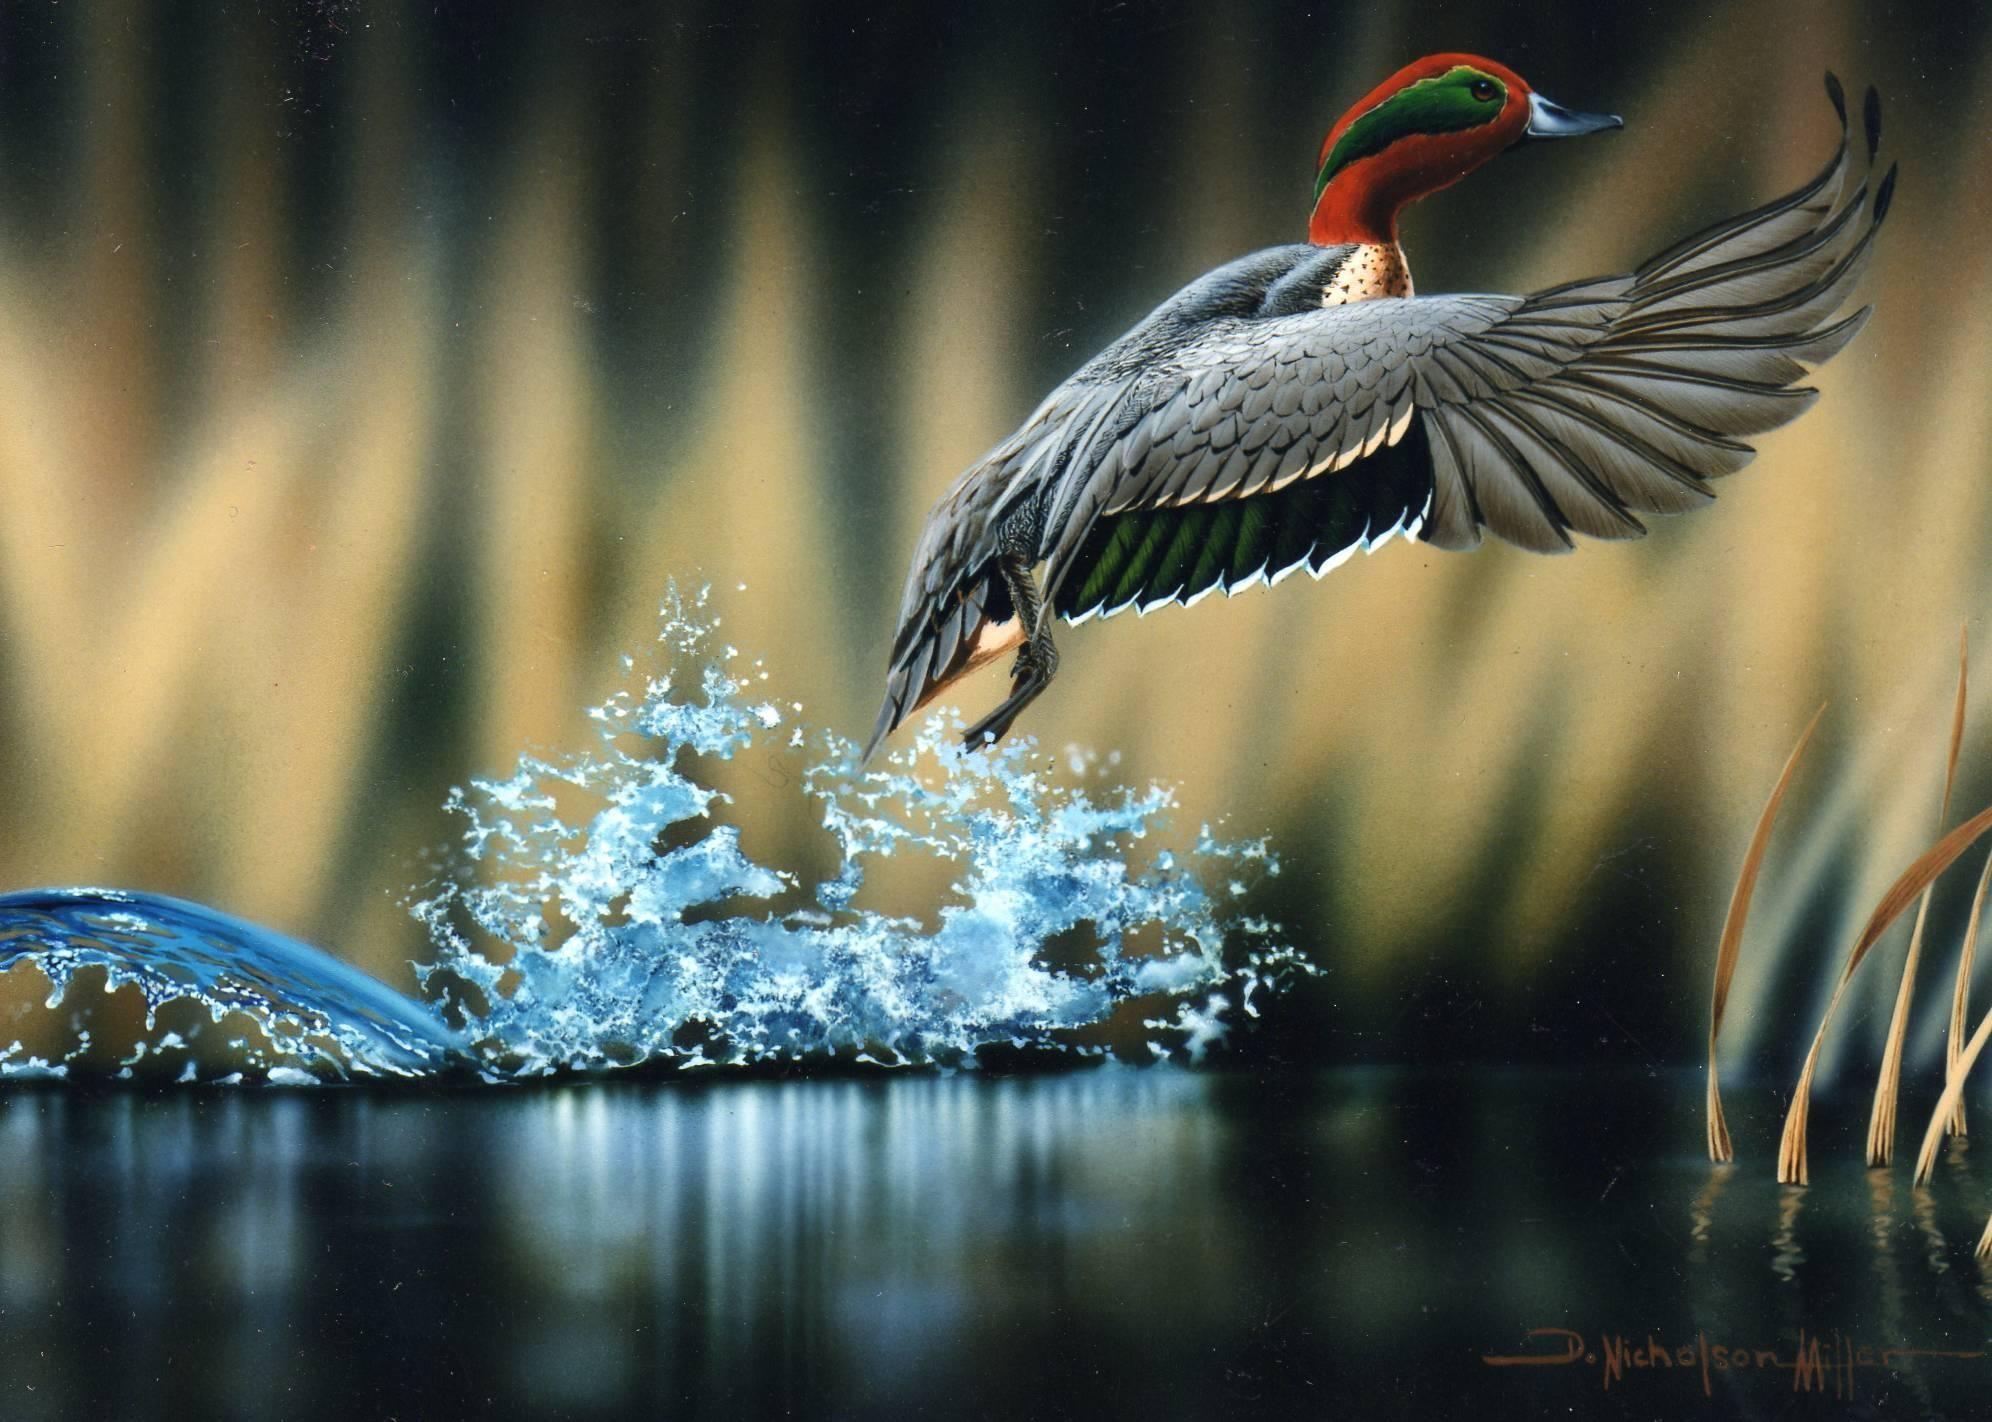 General 1992x1422 nature birds painting artwork digital art